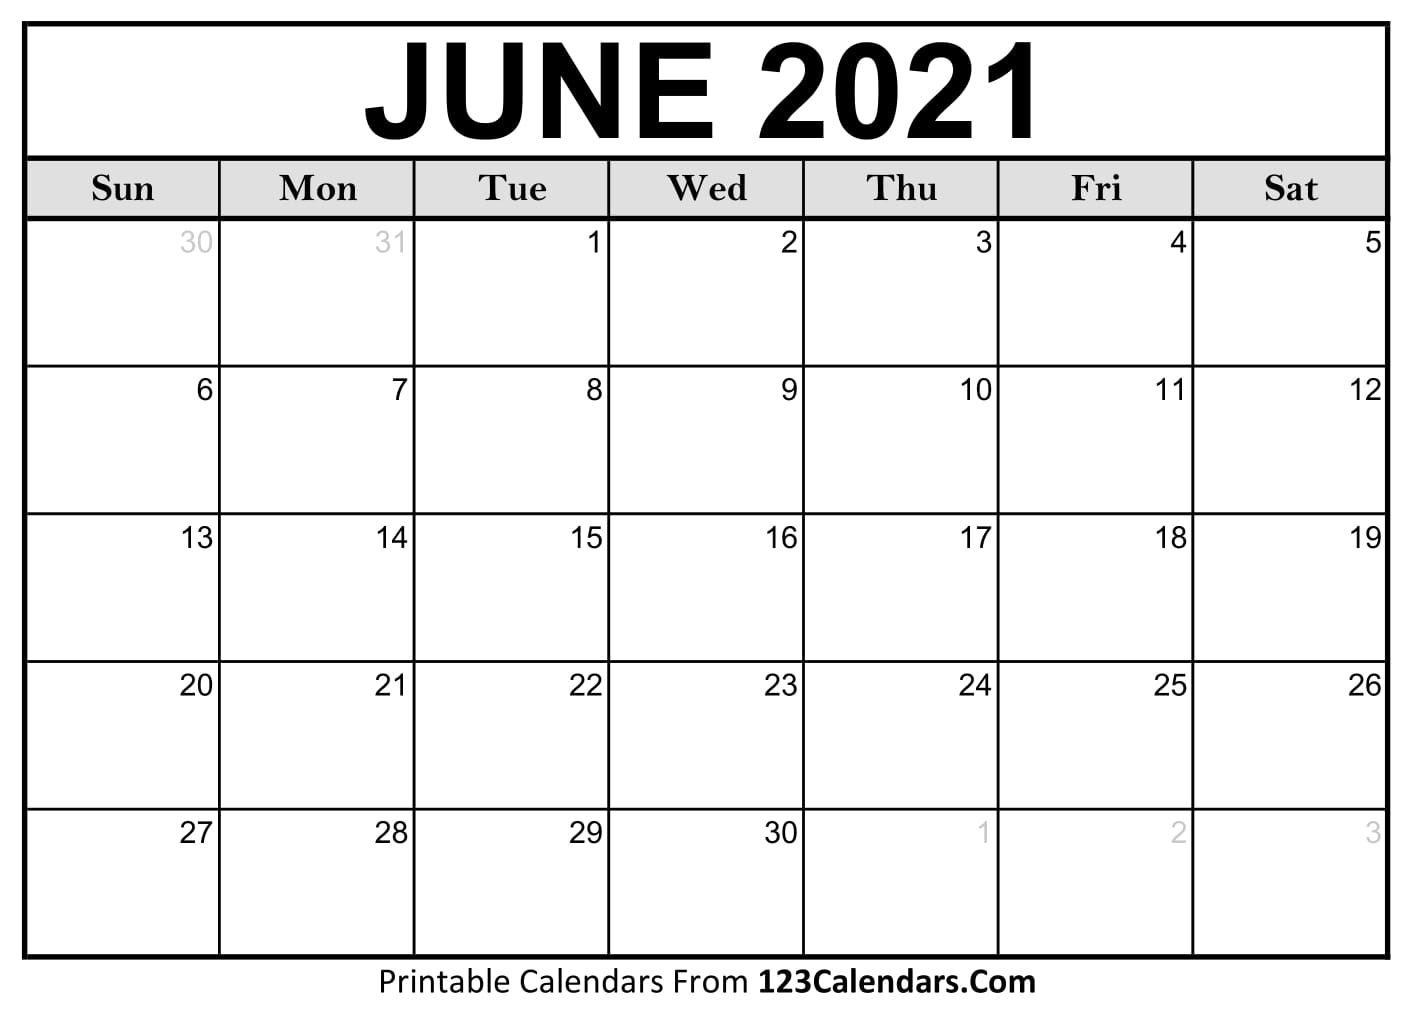 Printable June 2021 Calendar Templates | 123calendars